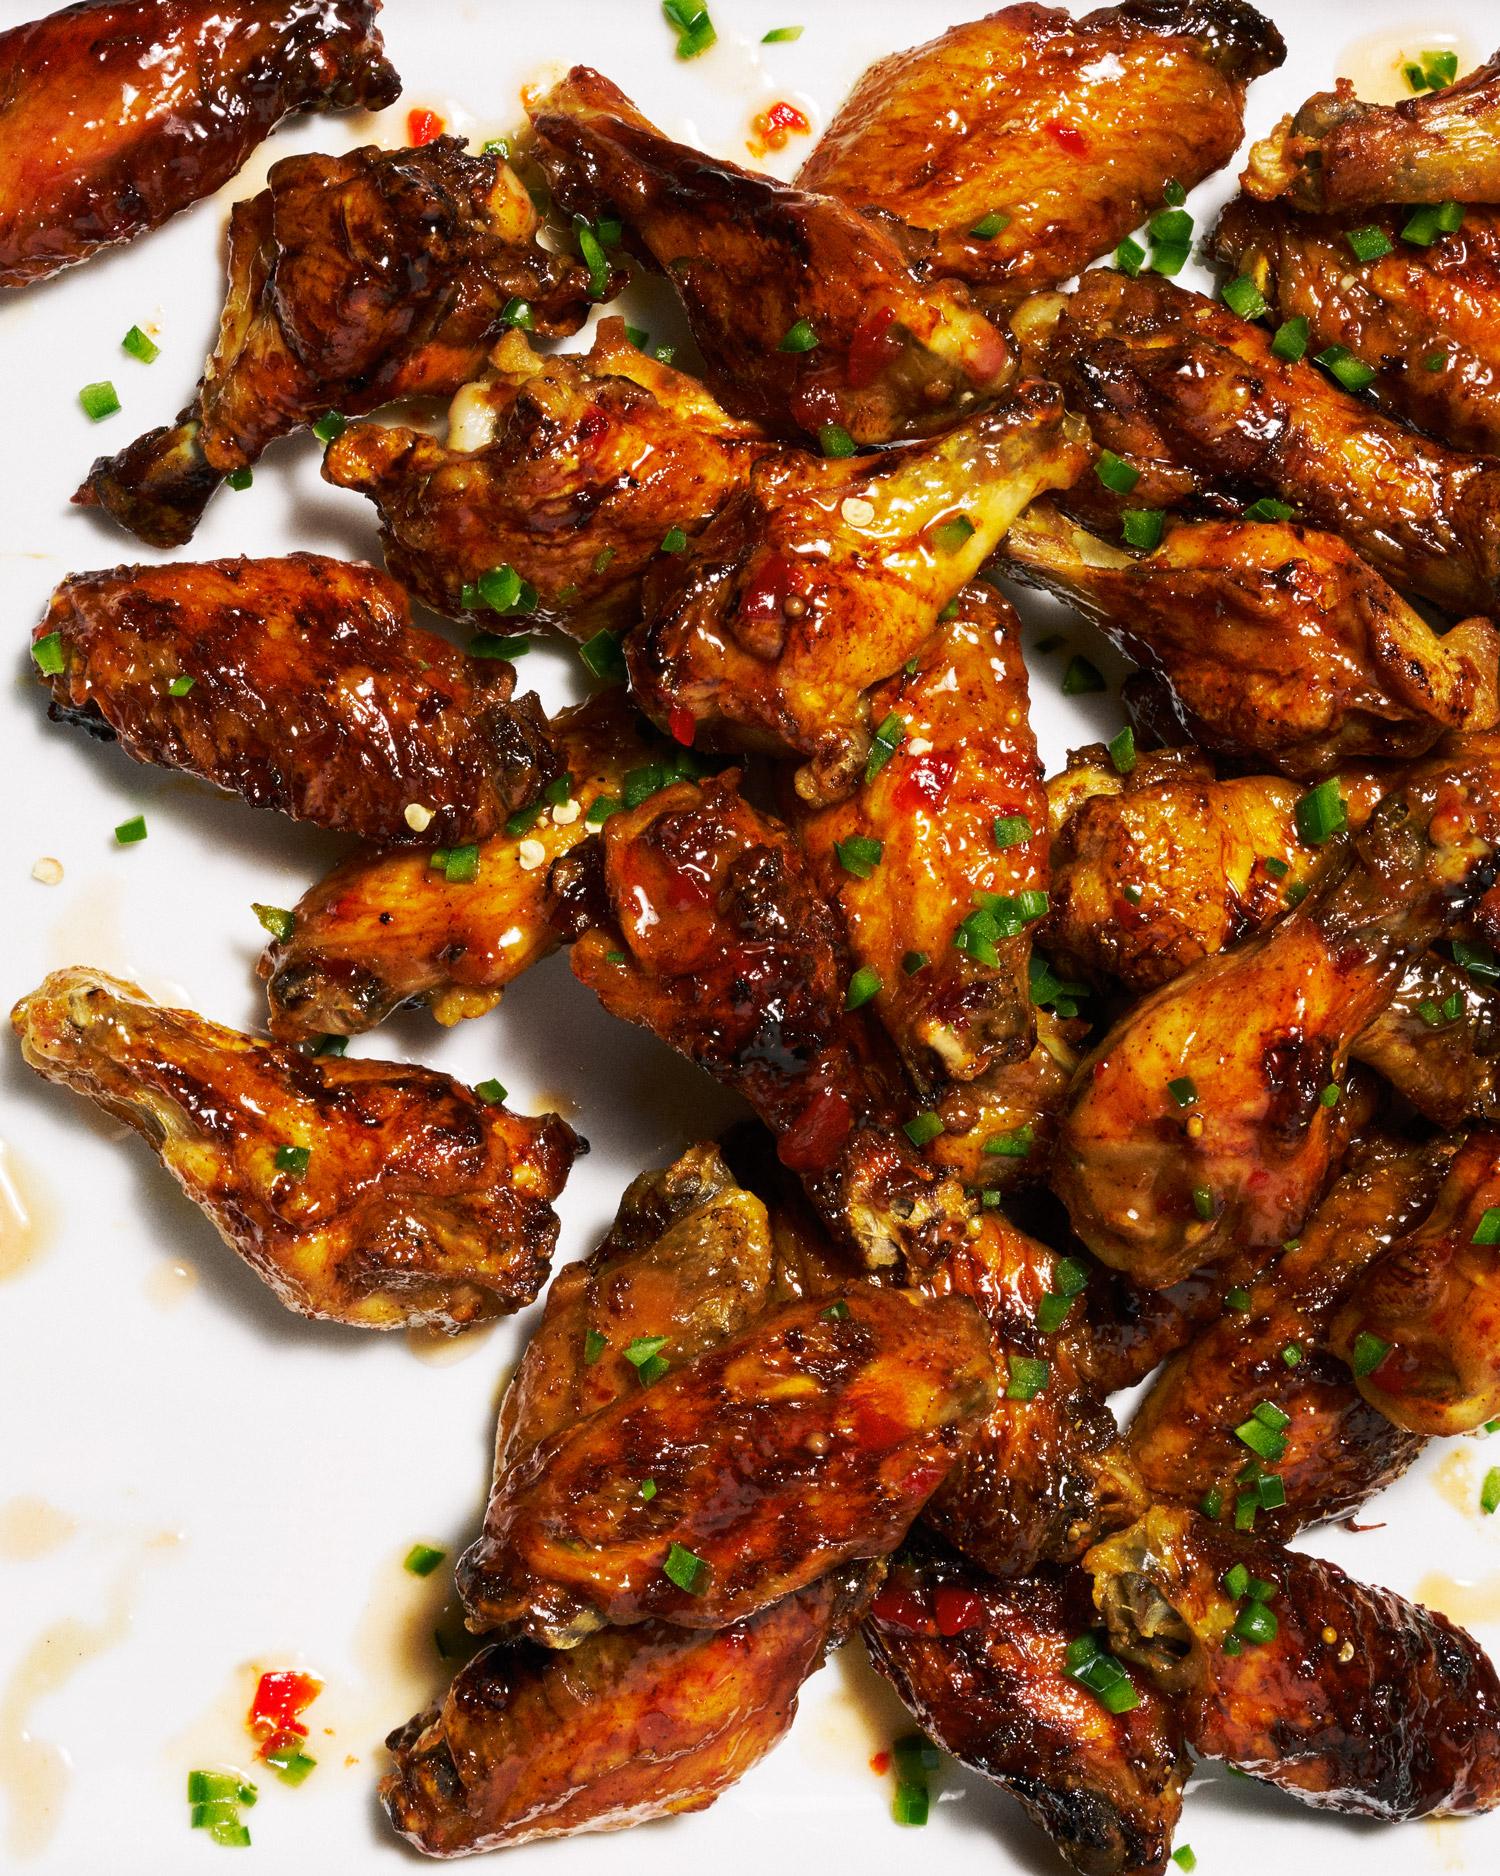 Smokin' Hot Baked Wings